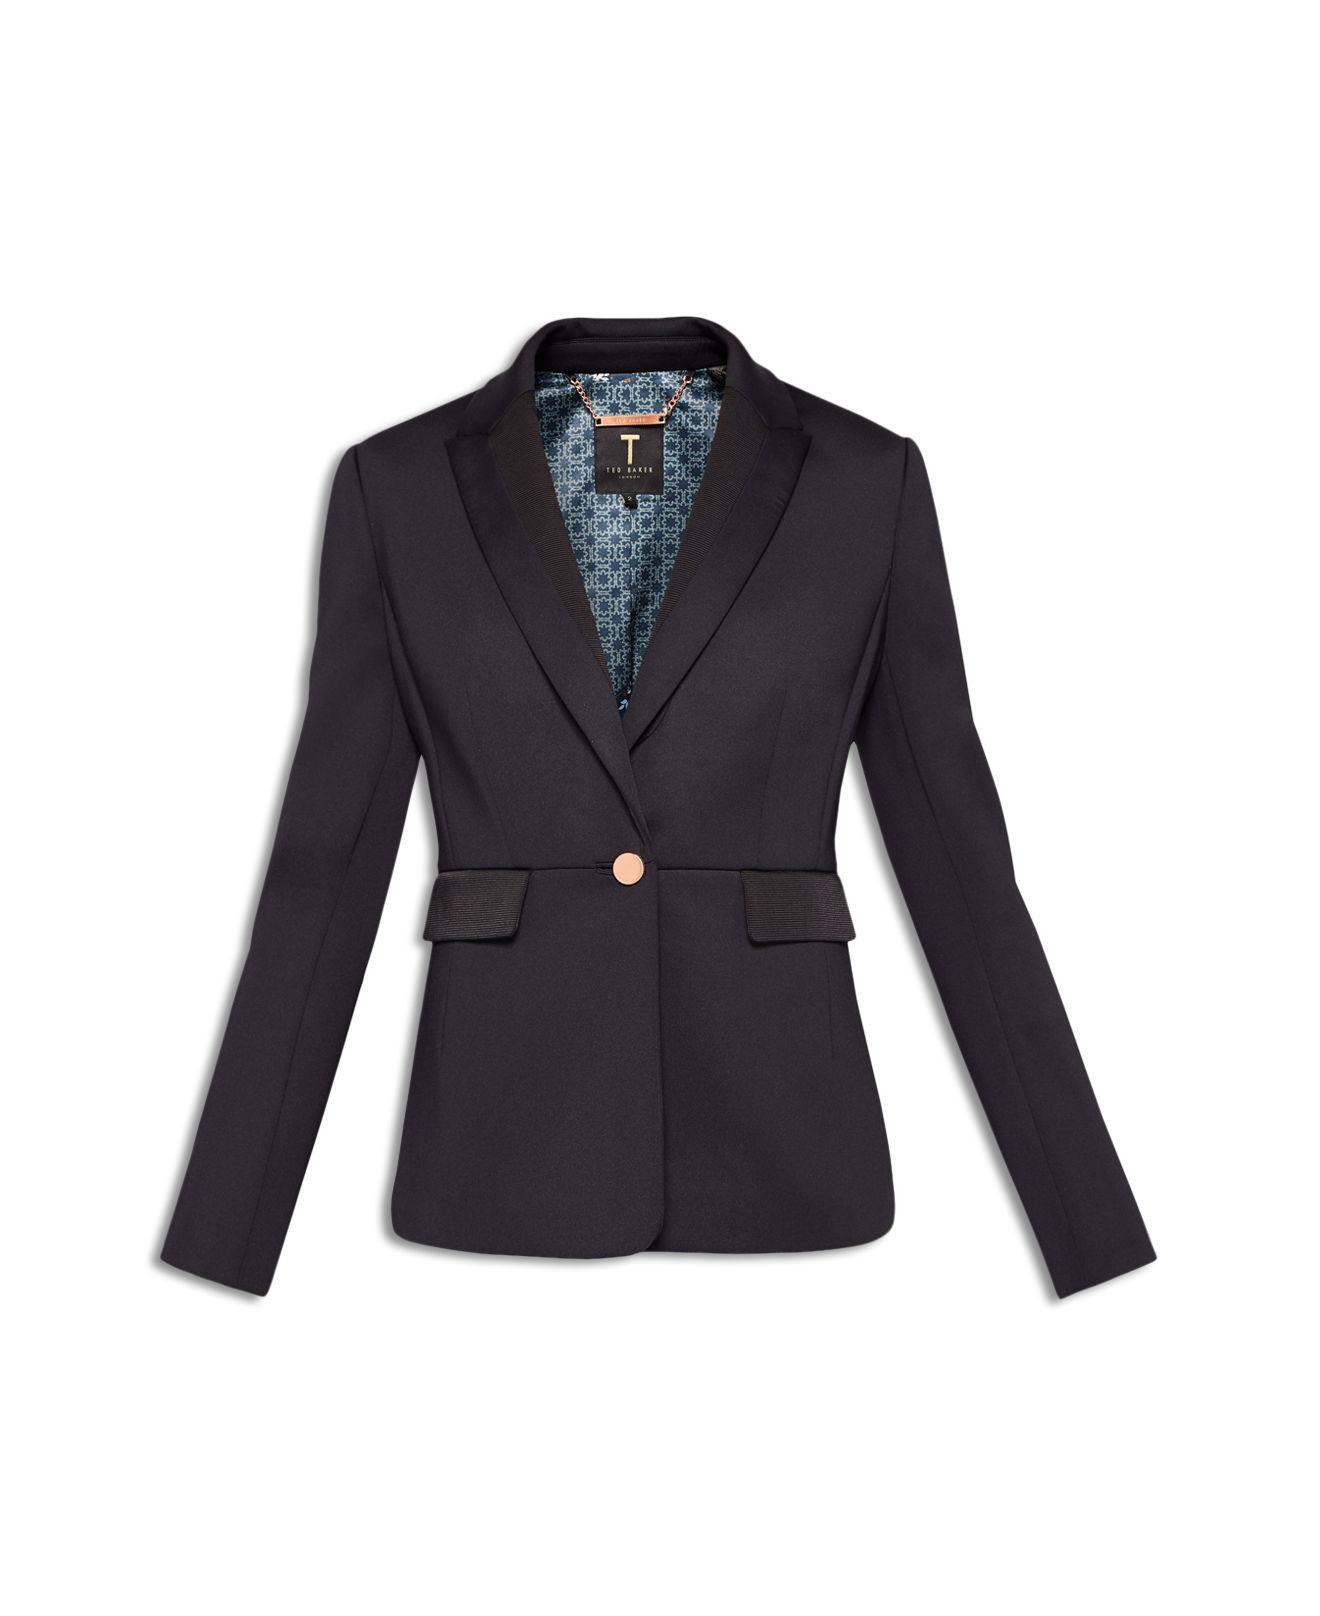 7872960bd01824 Lyst - Ted Baker Gresa Ottoman Contrast Blazer in Black